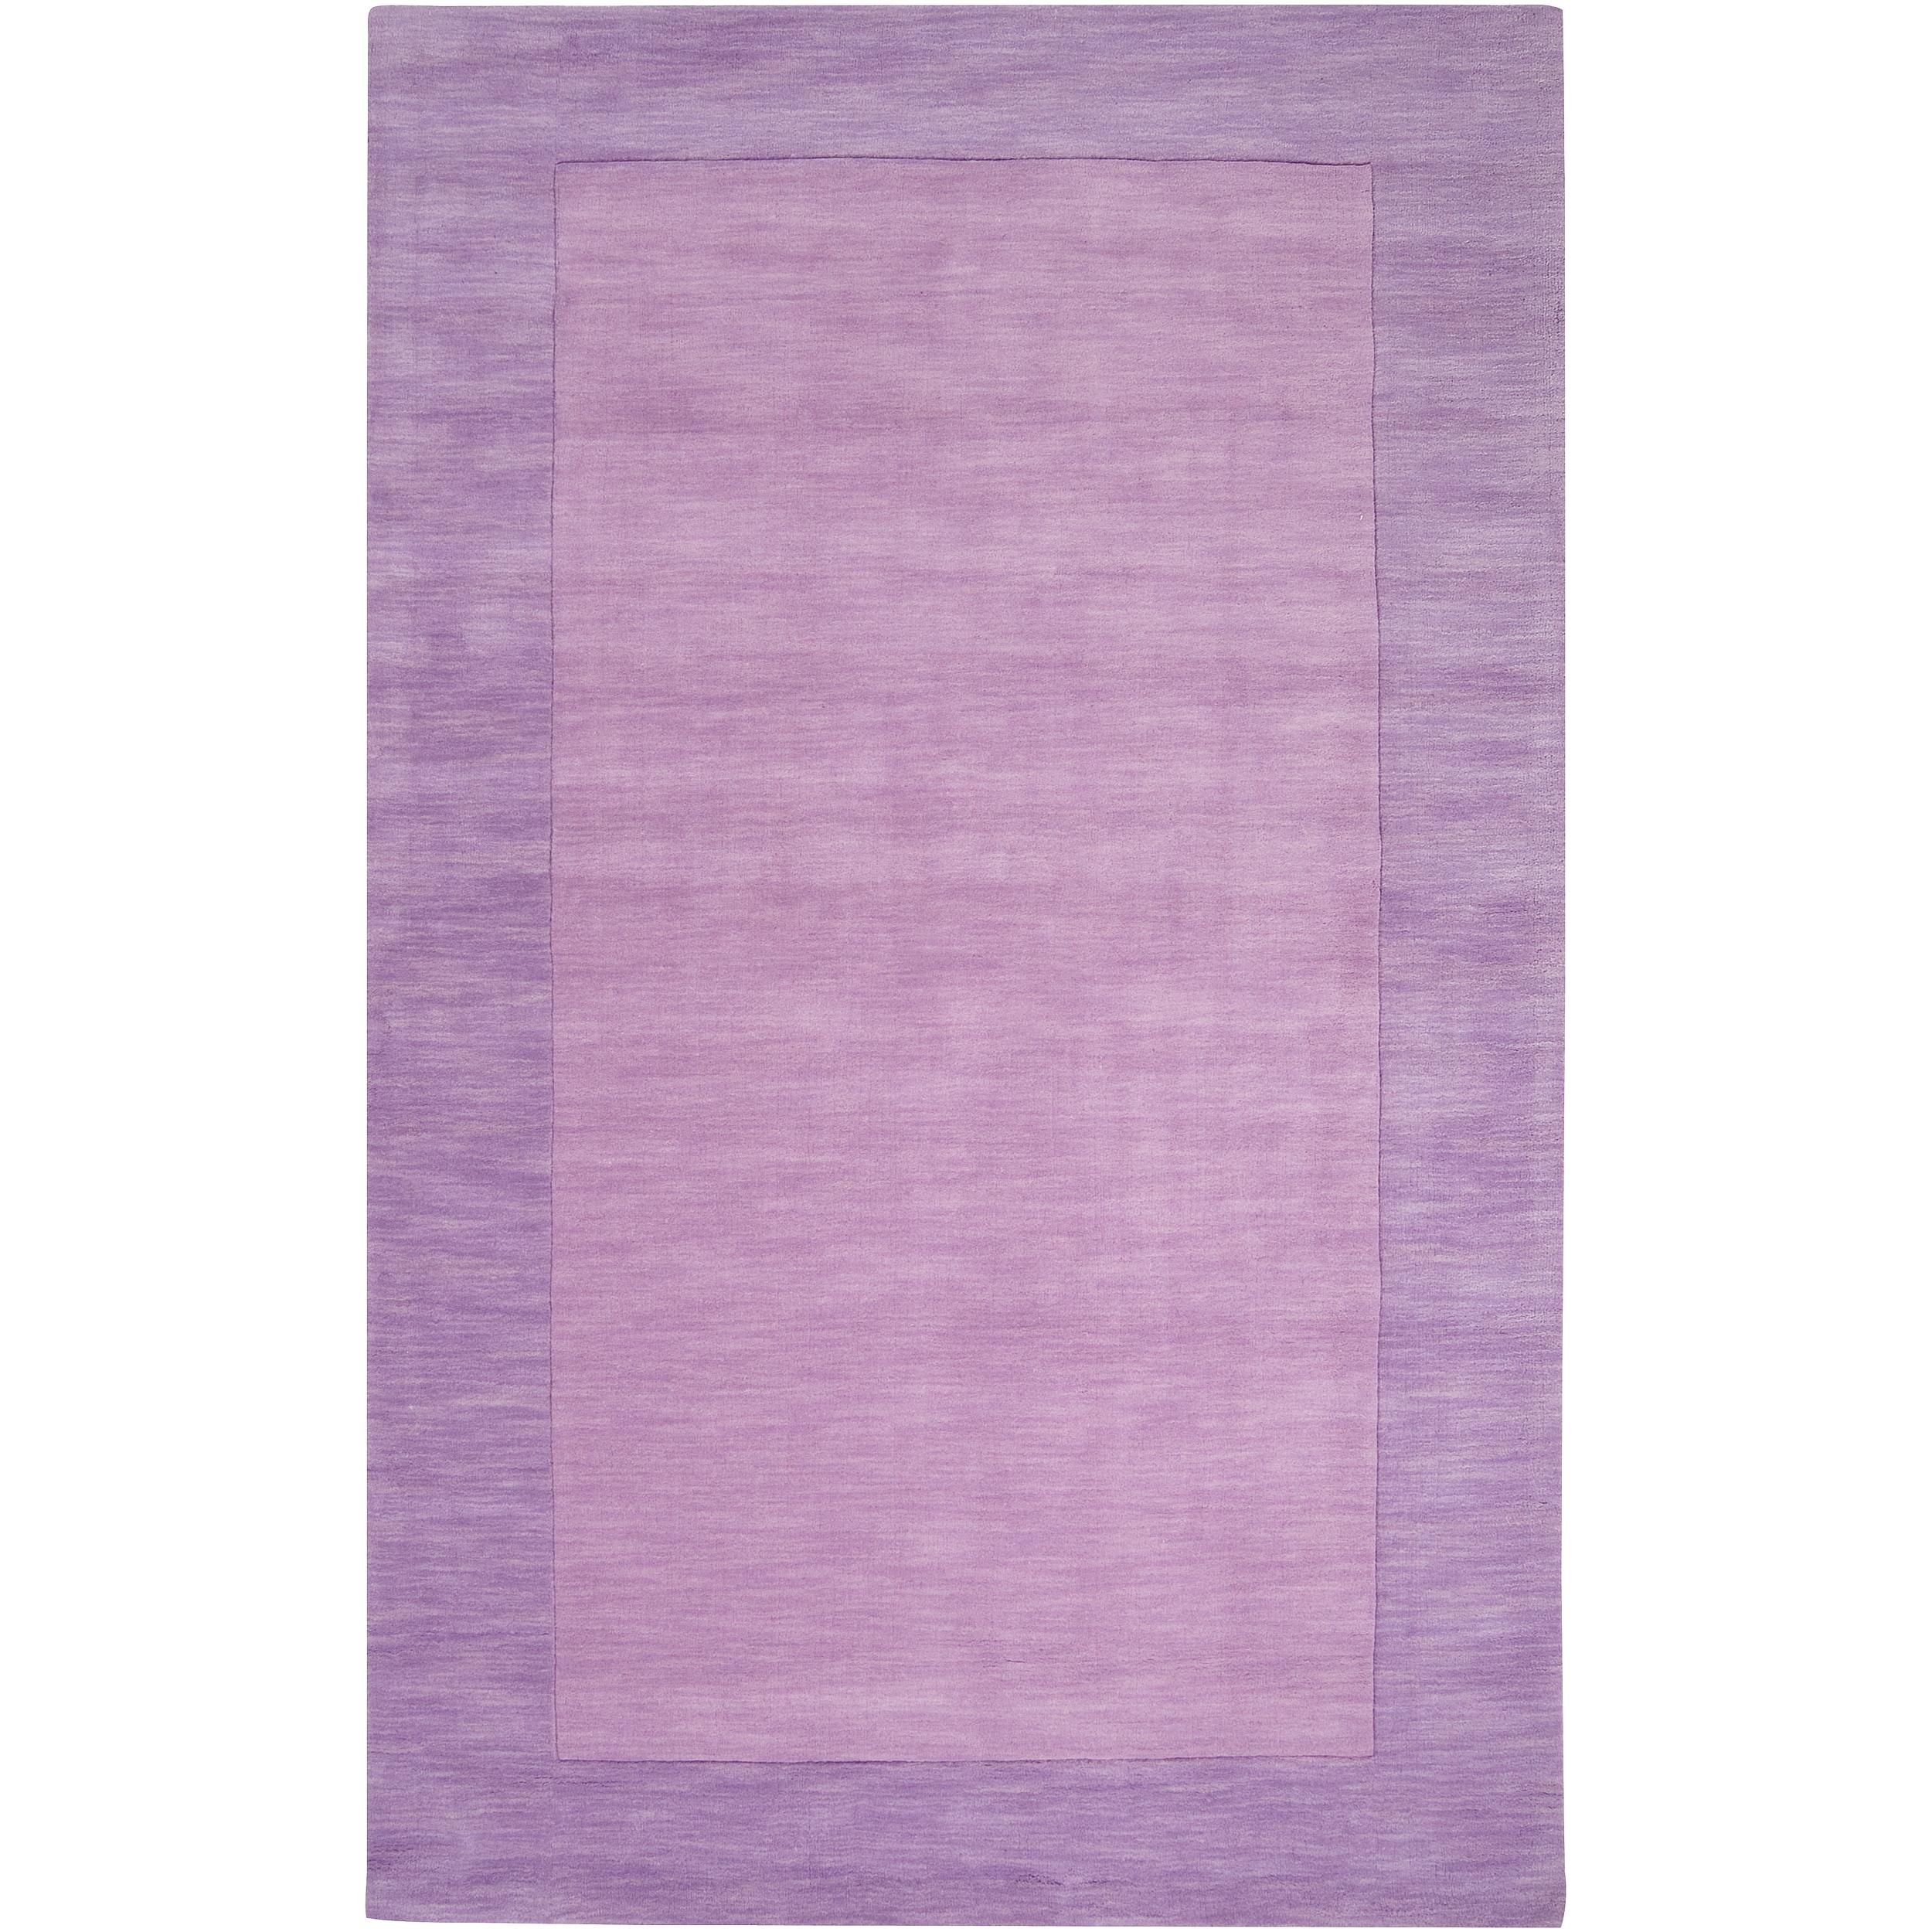 Hand-crafted Purple Tone-On-Tone Bordered Emeto Wool Rug (3'3 x 5'3)